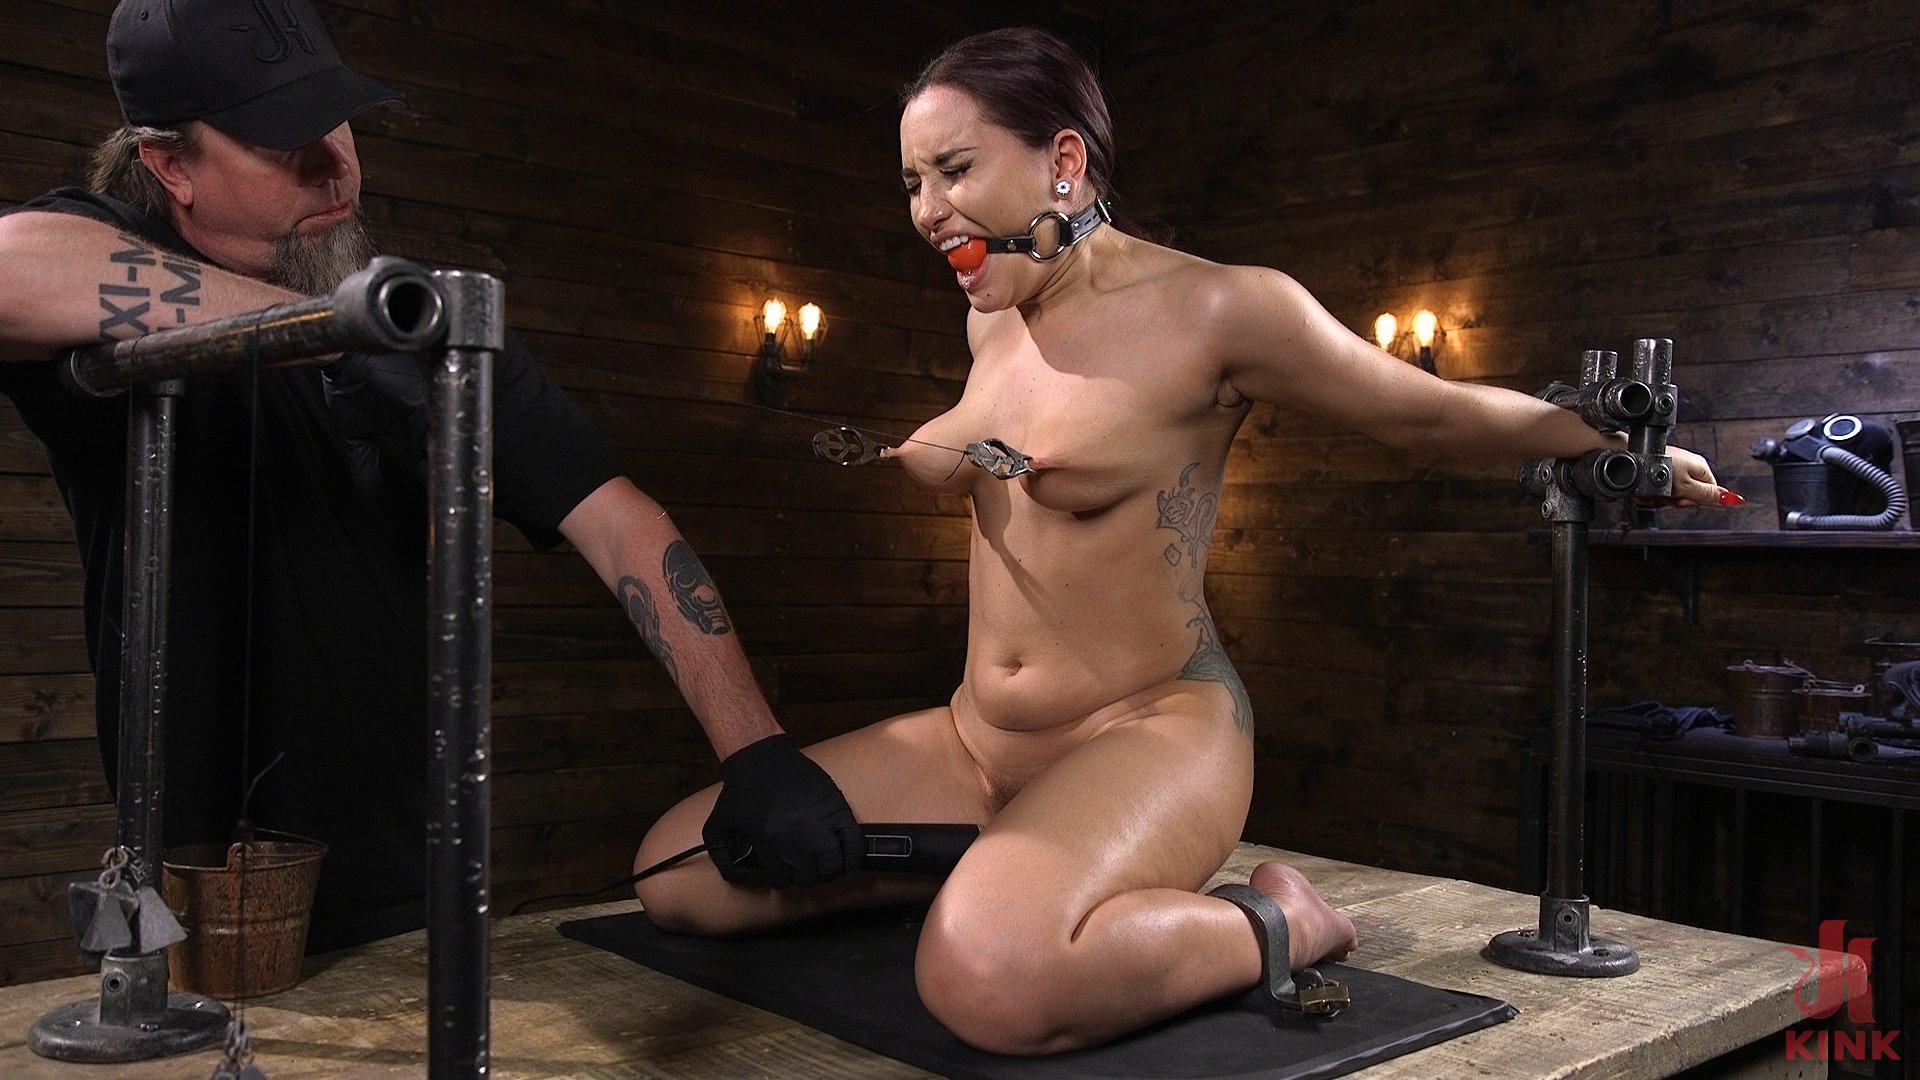 Gabriella Paltrova Anal Orgasm in Diabolical Predicament Bondage